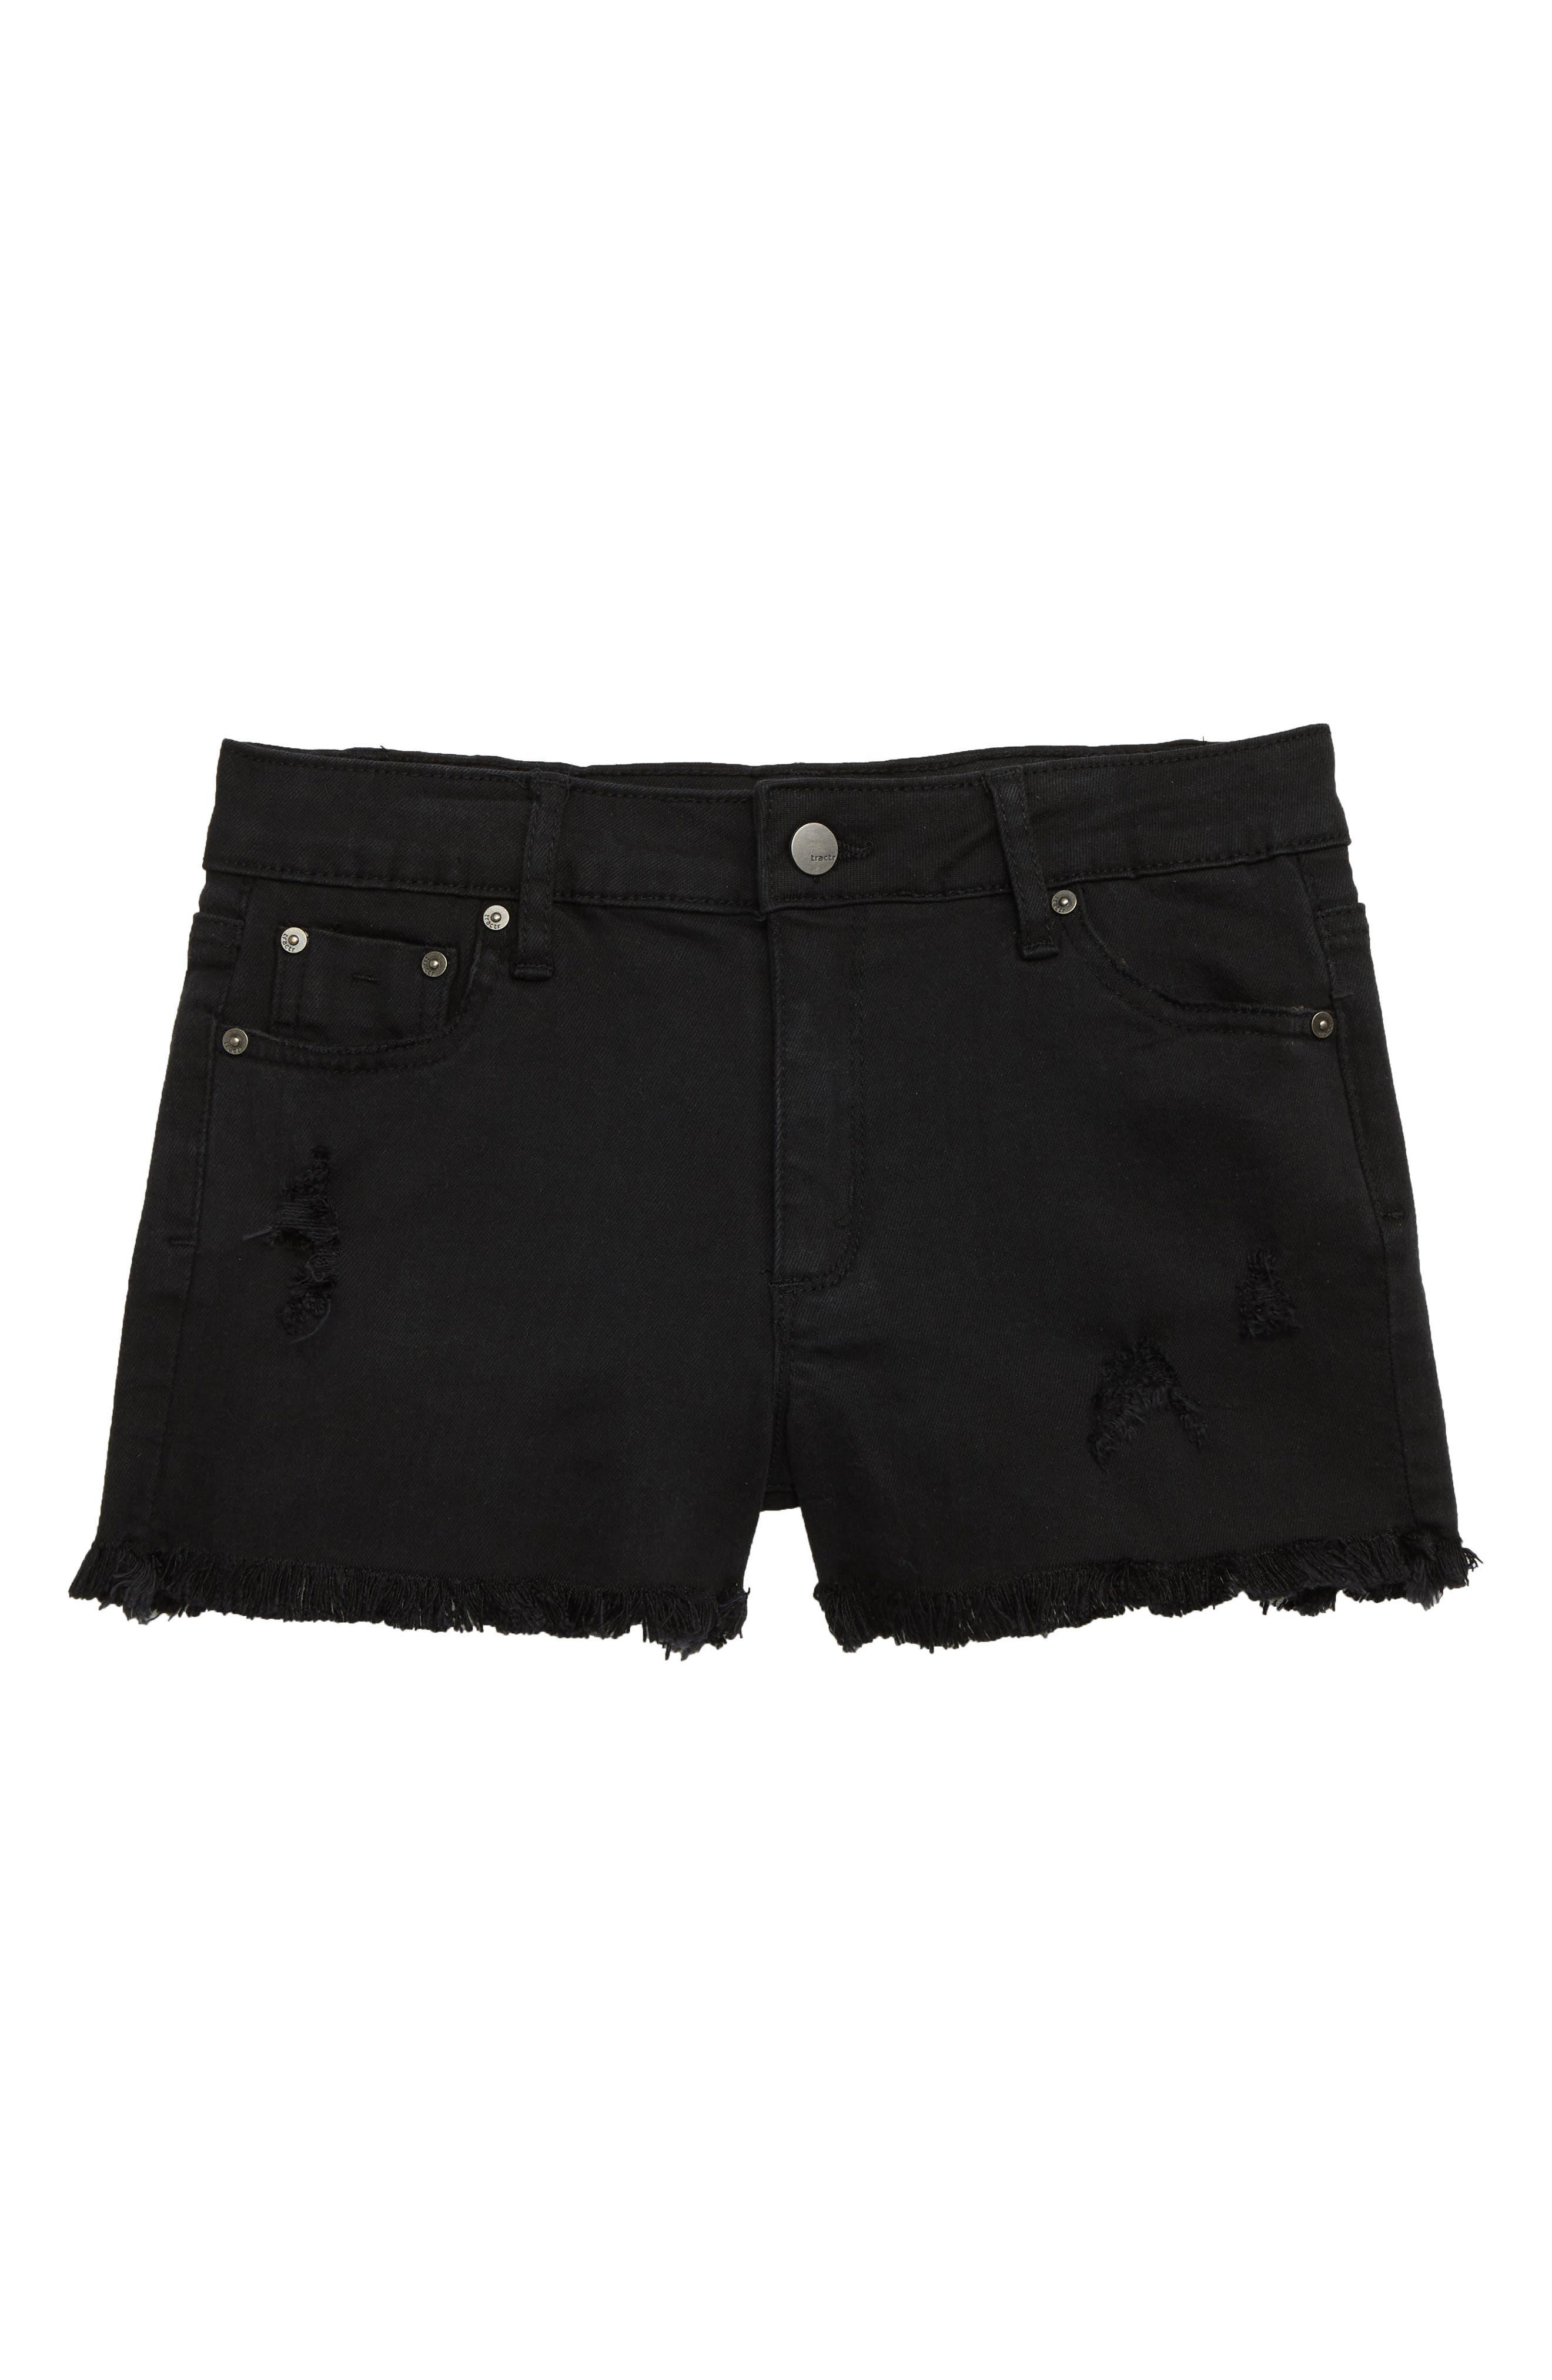 Cutoff Denim Shorts,                             Main thumbnail 1, color,                             BLACK